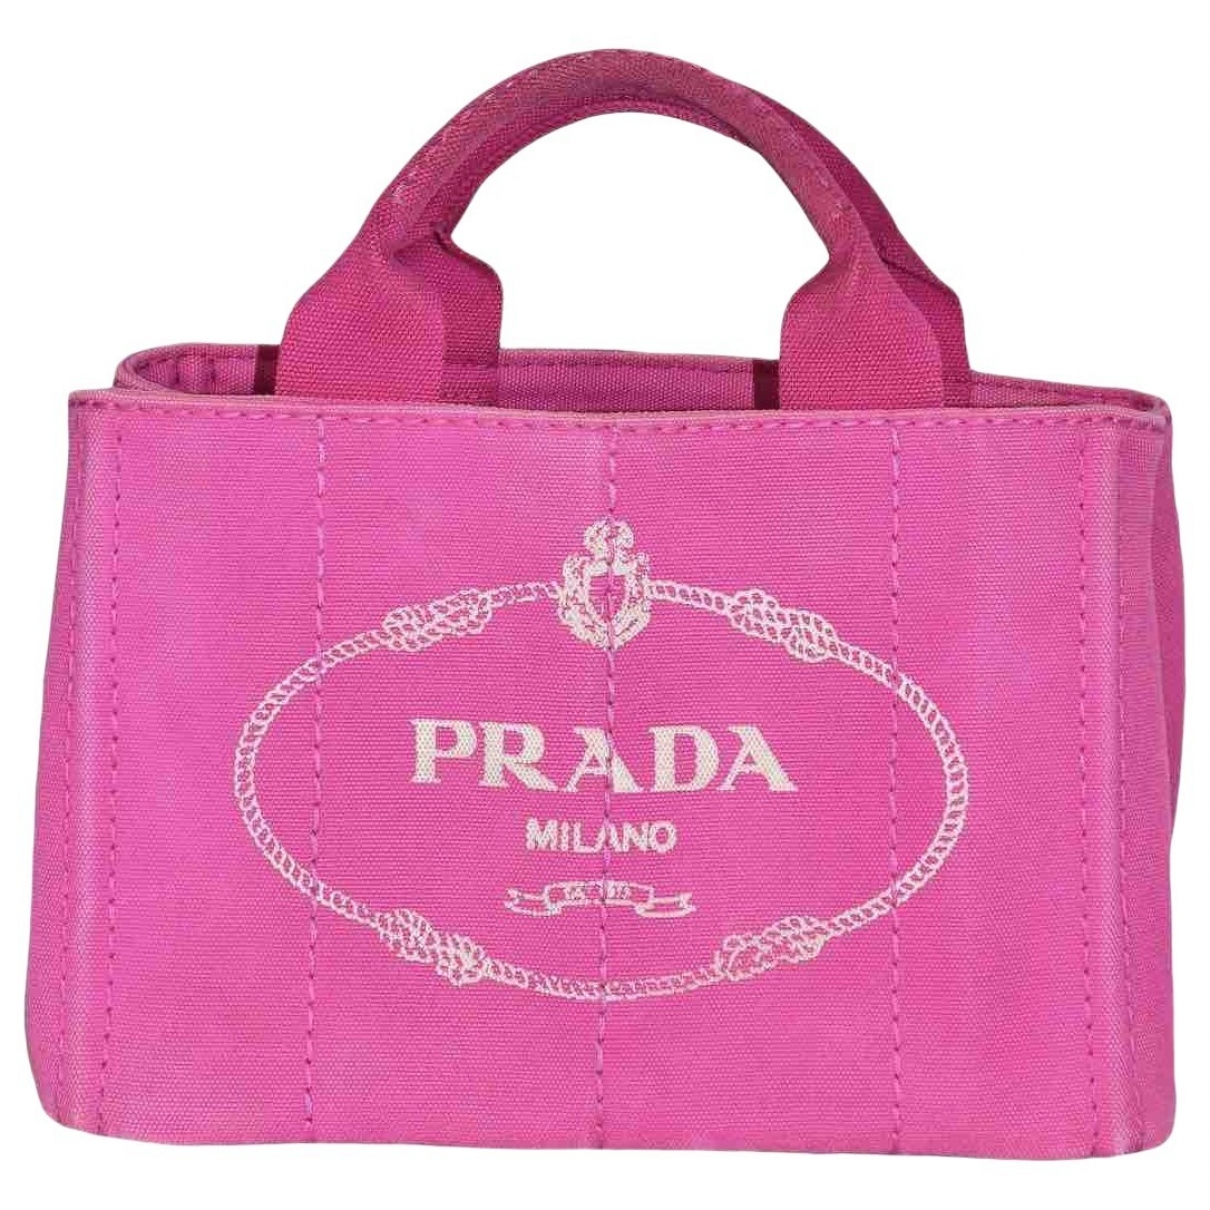 Prada \N Handtasche in  Rosa Baumwolle